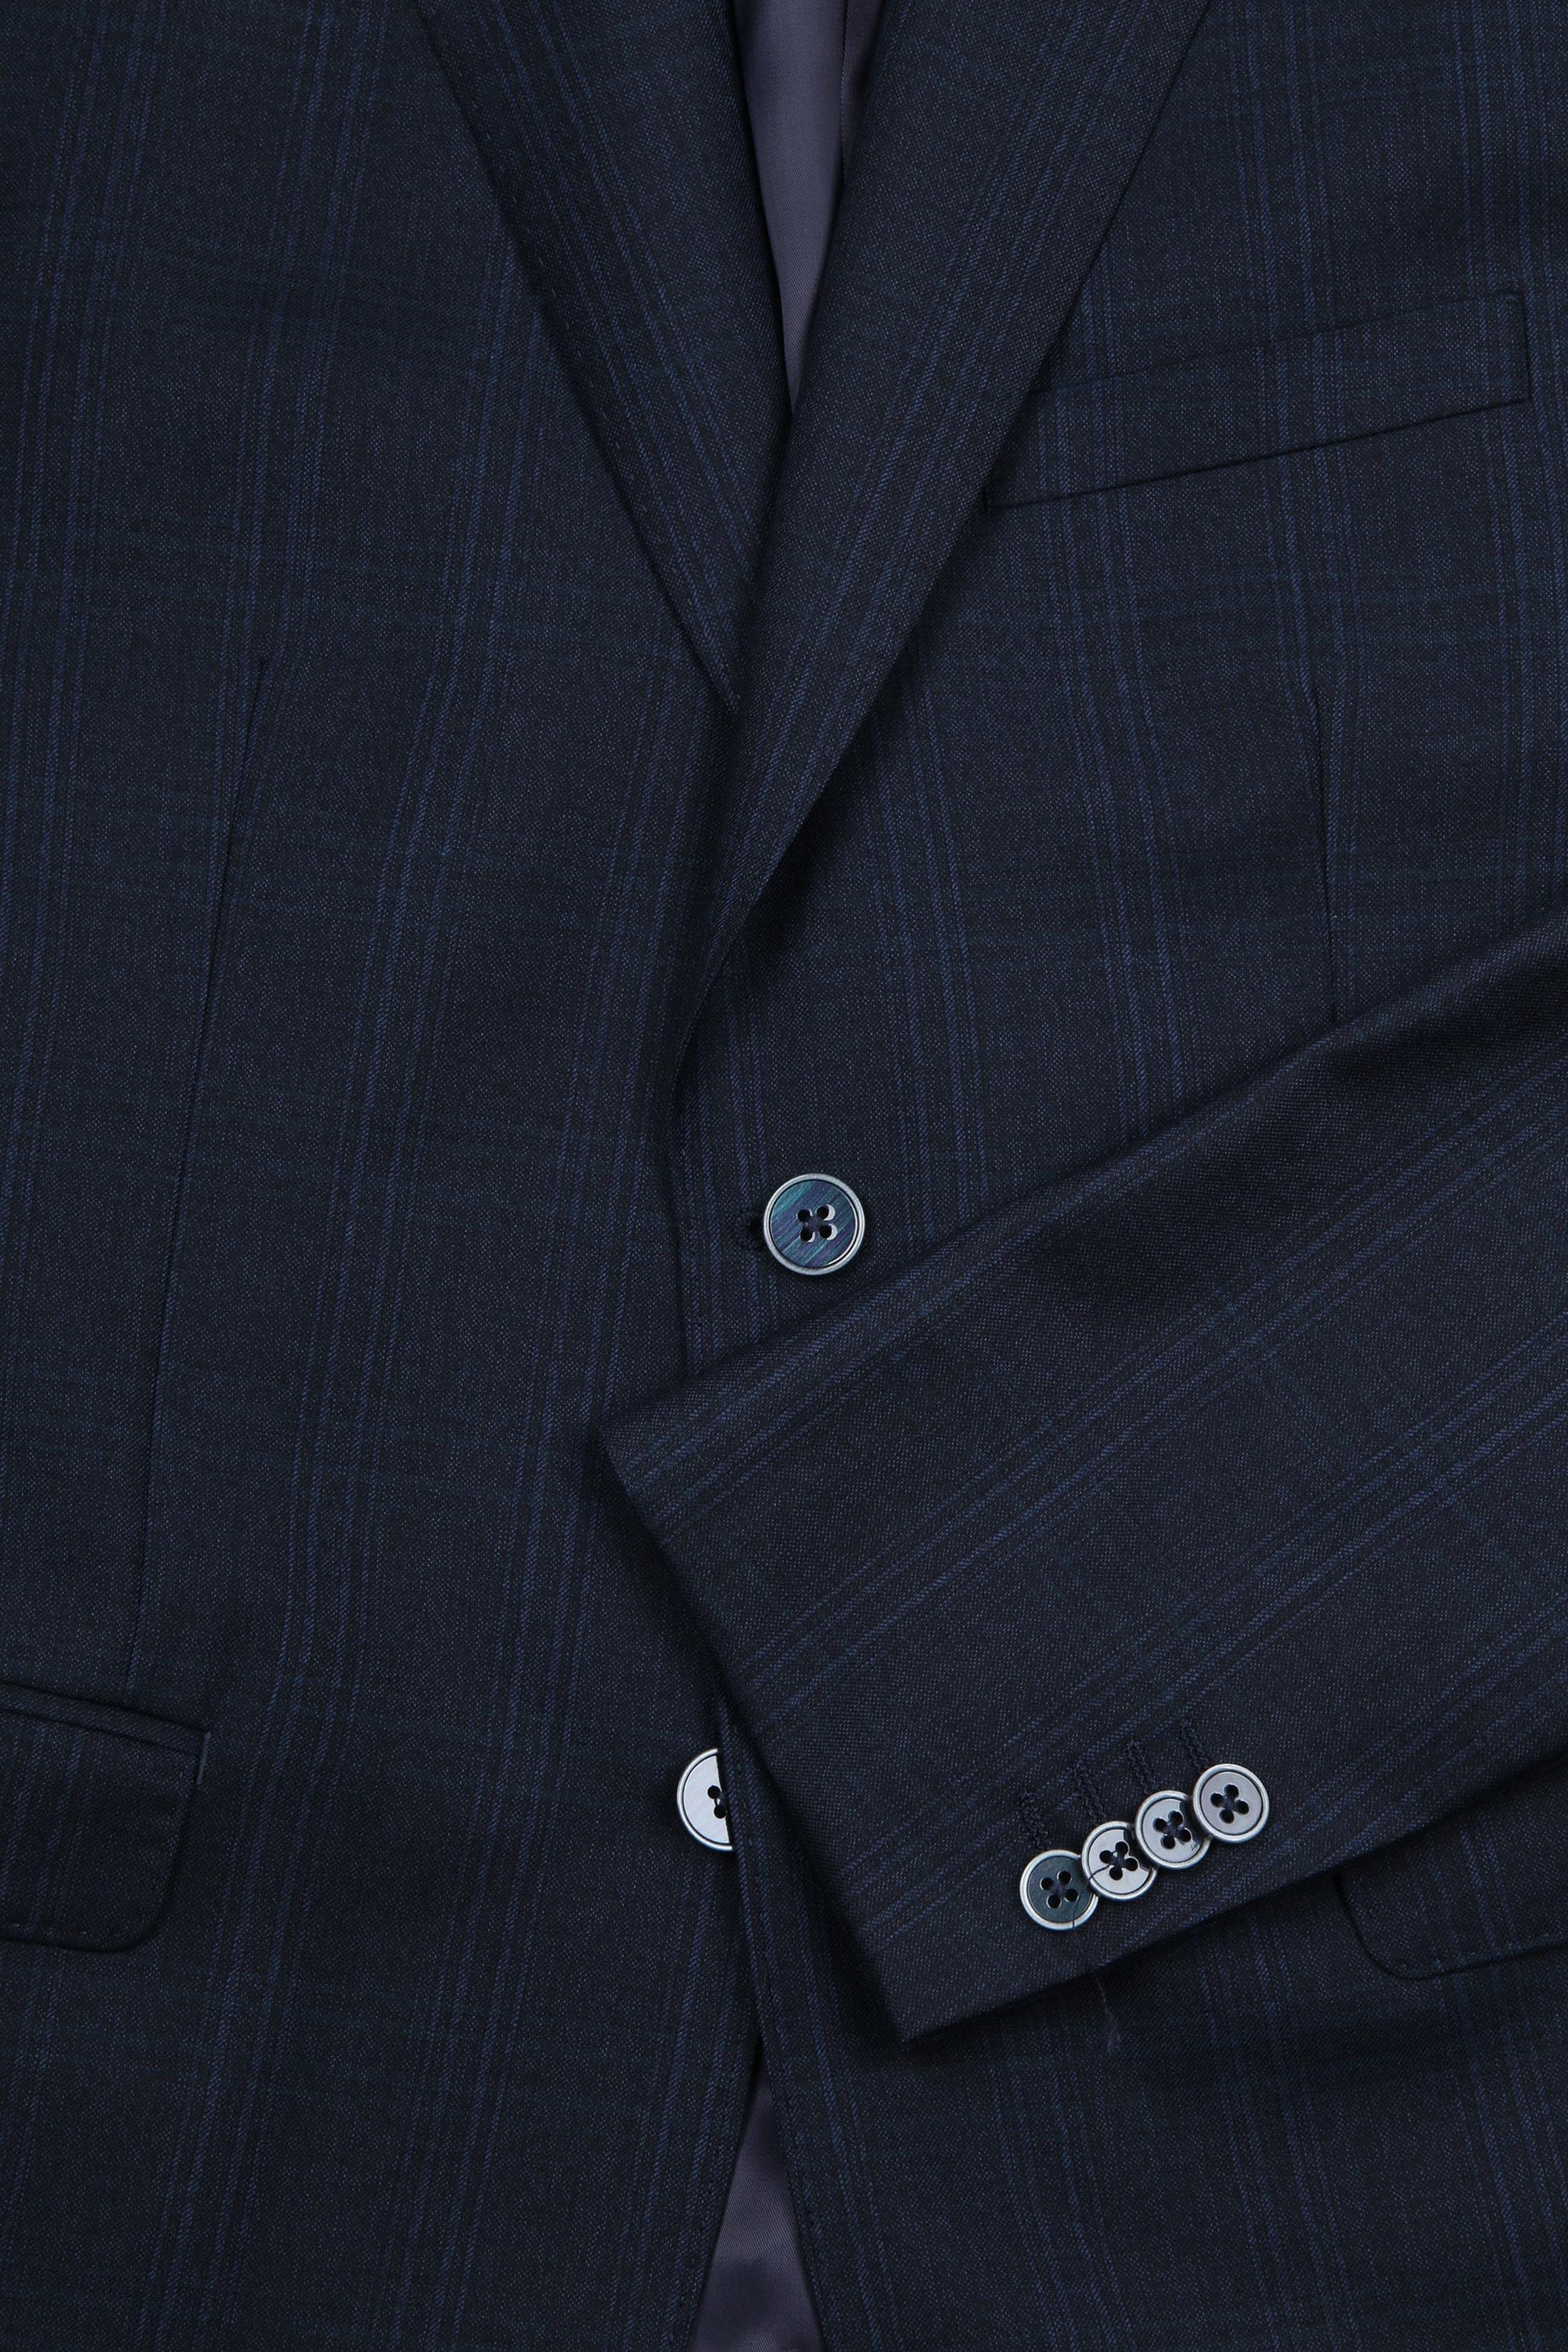 Suitable Strato Anzug Dunkelblau Fenster foto 5